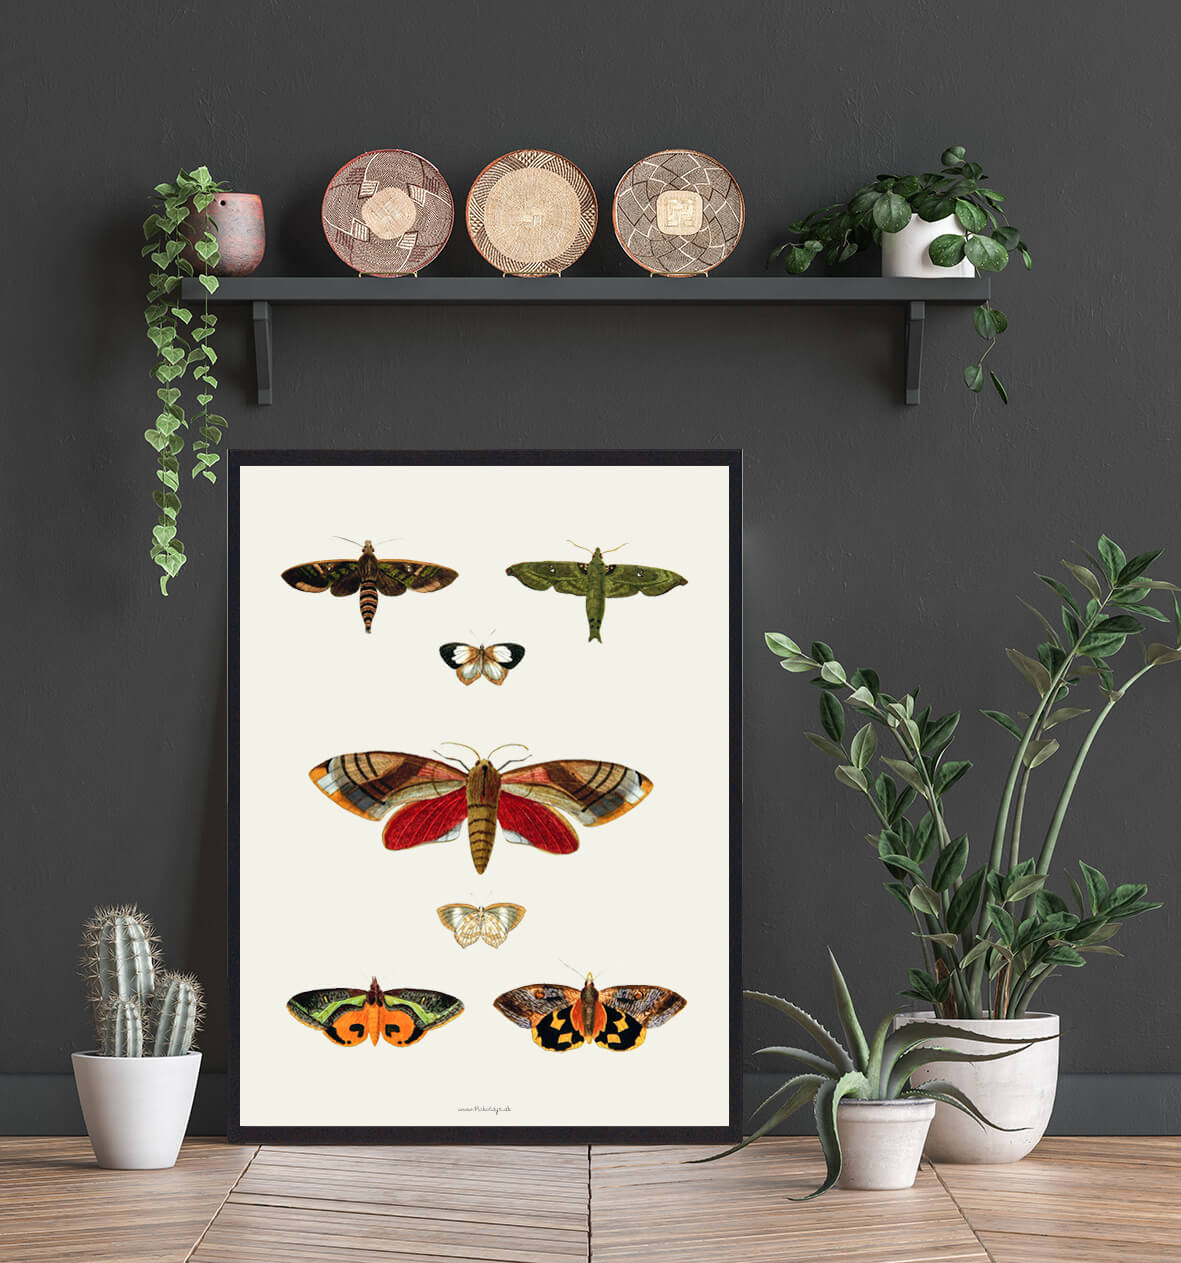 sommerfugle-plakat-indretning-3